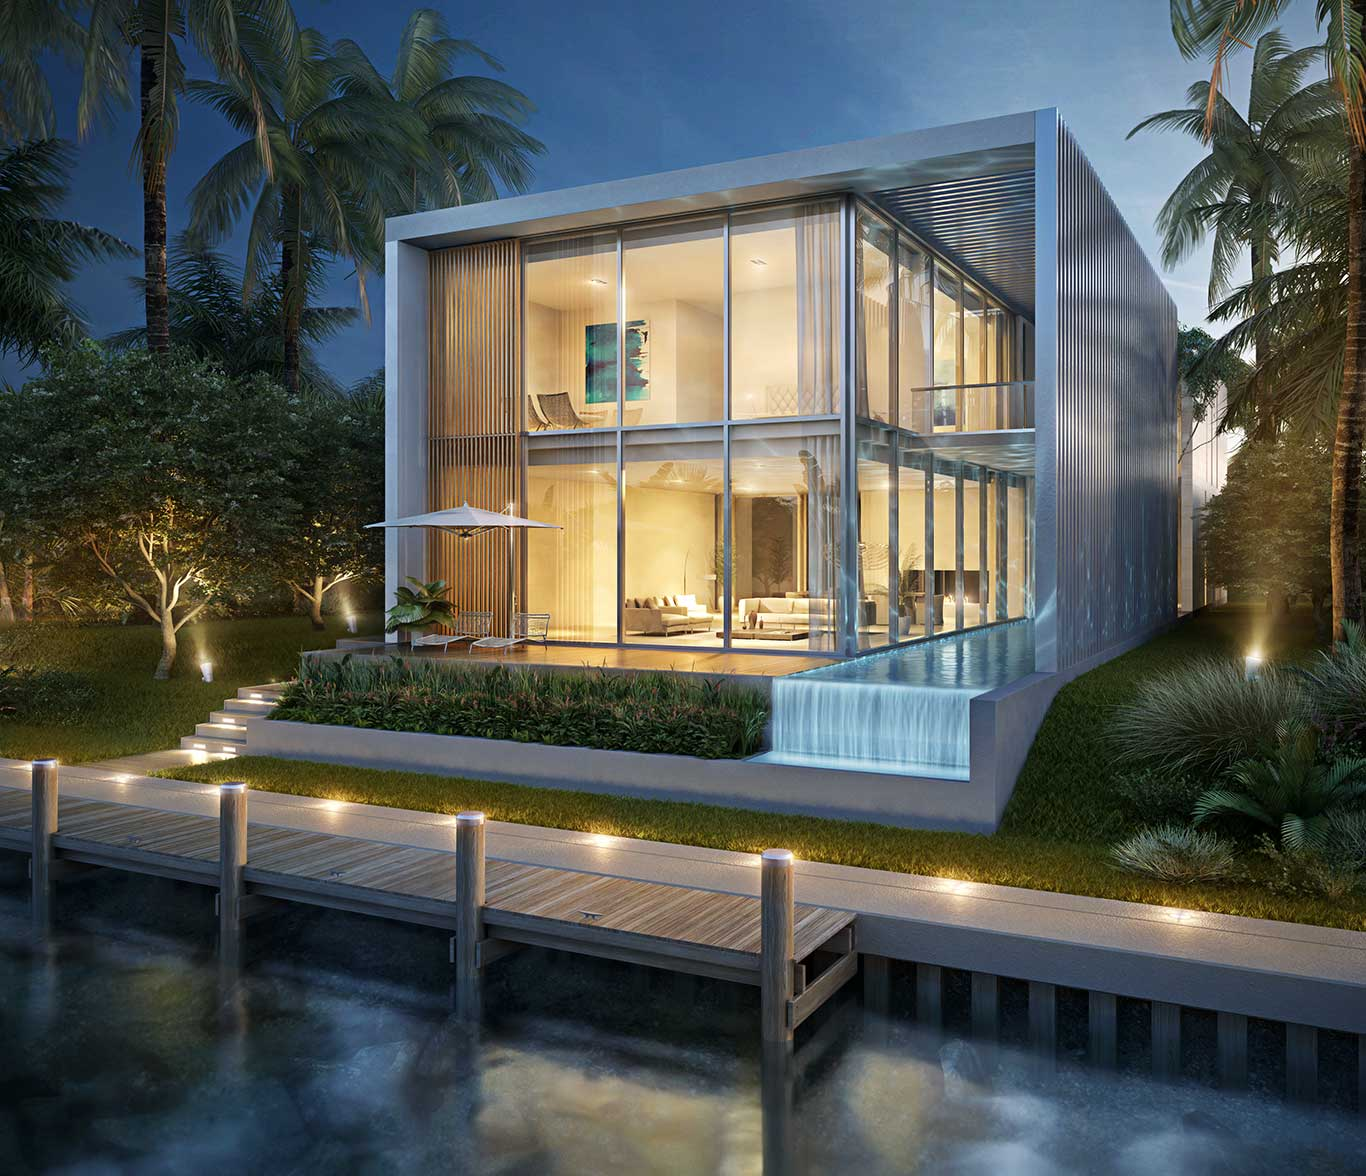 The Ritz-Carlton Residences, Miami Beach Villa